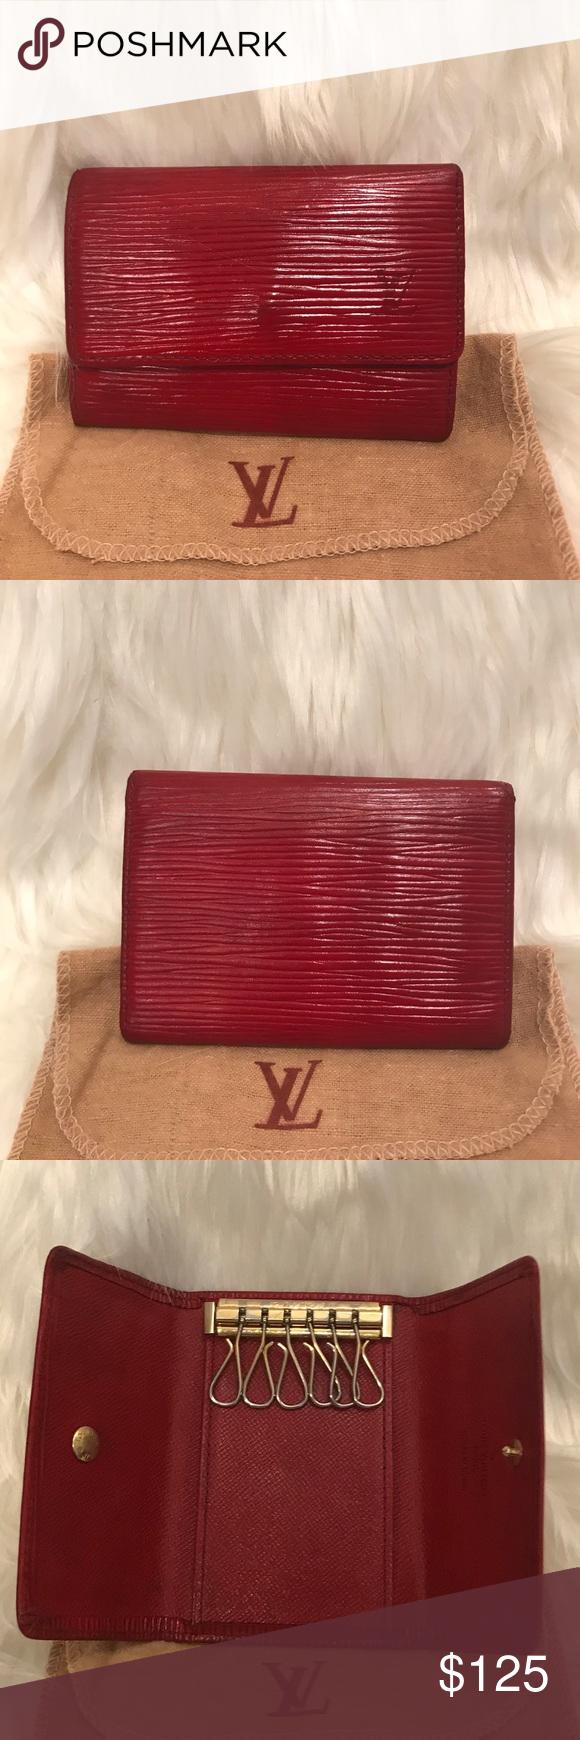 e054d0c6 Vintage Louis Vuitton Red Epi Leather 6 Key Holder It's old but ...